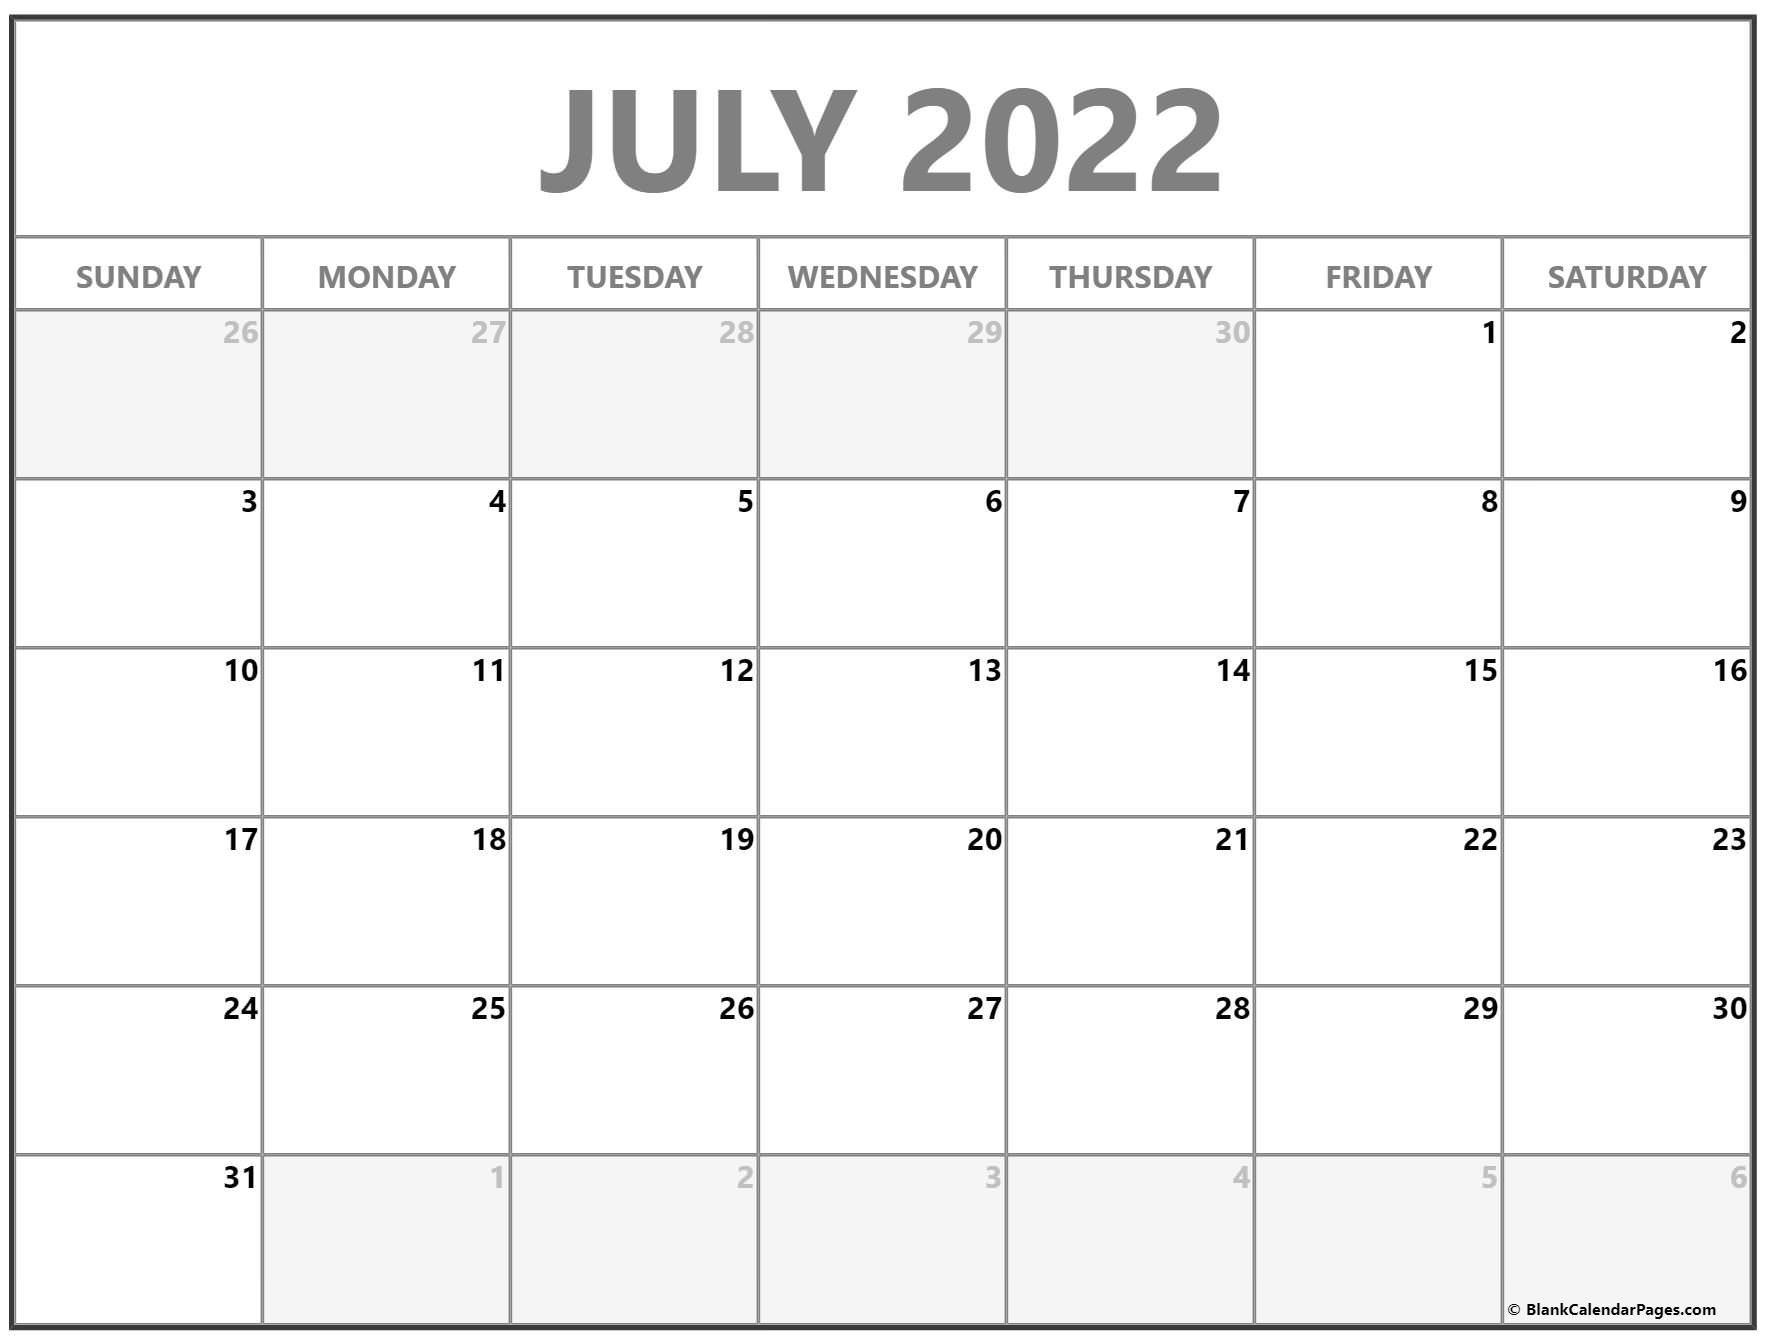 July 2022 Calendar | Free Printable Calendar Templates regarding Free Printable Monthly Planner 2022